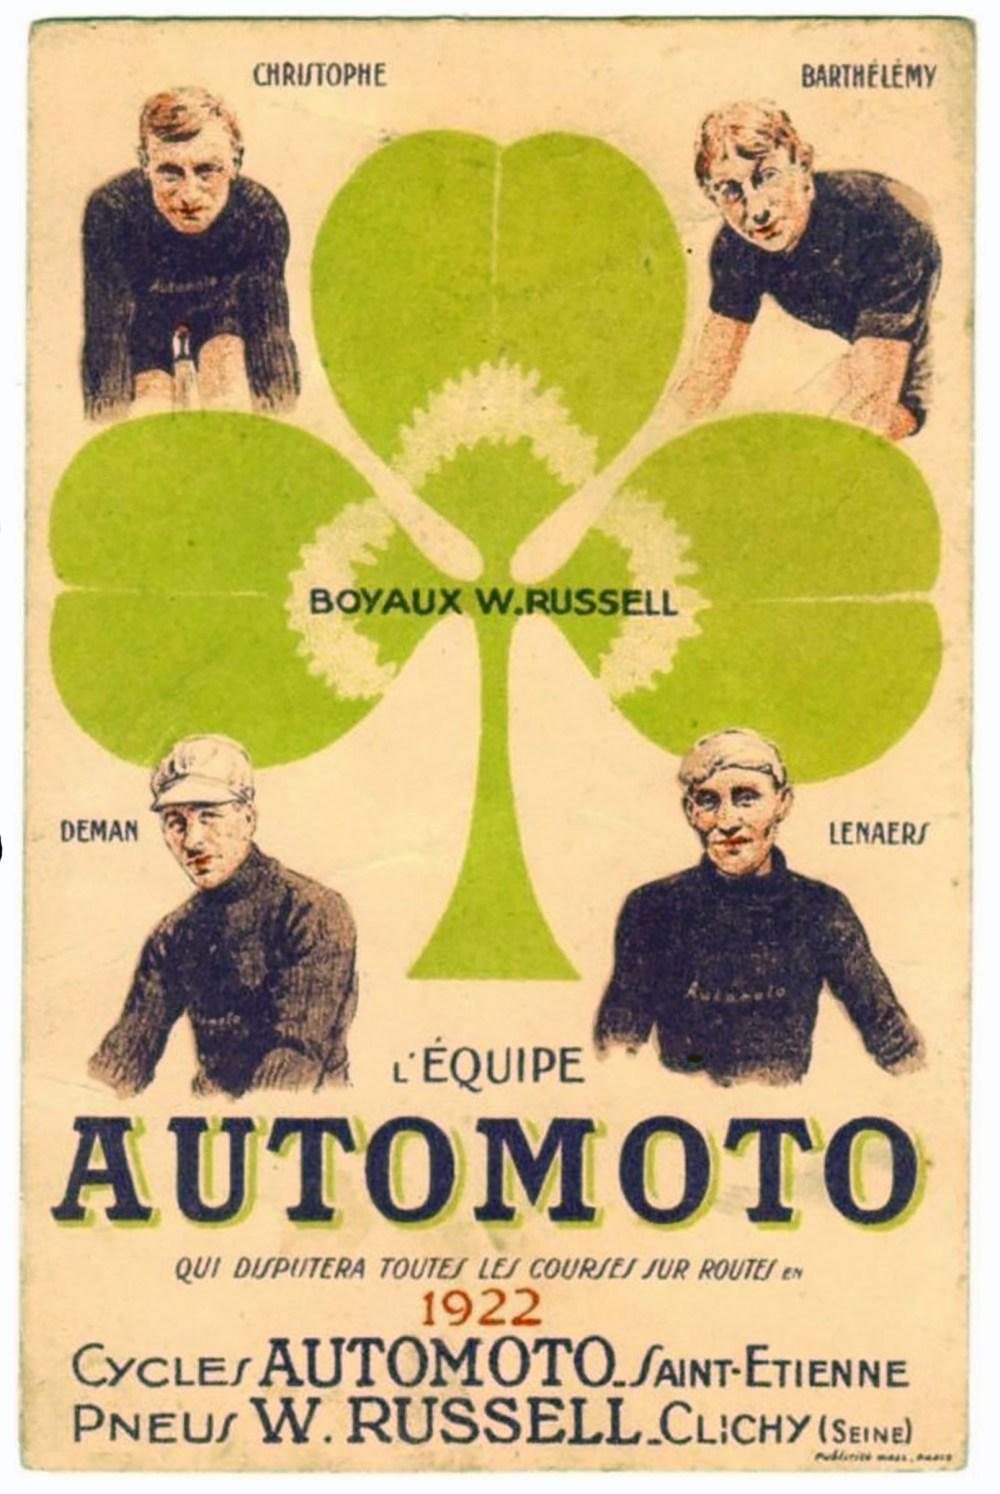 ebykr-1922-team-automoto-postcard